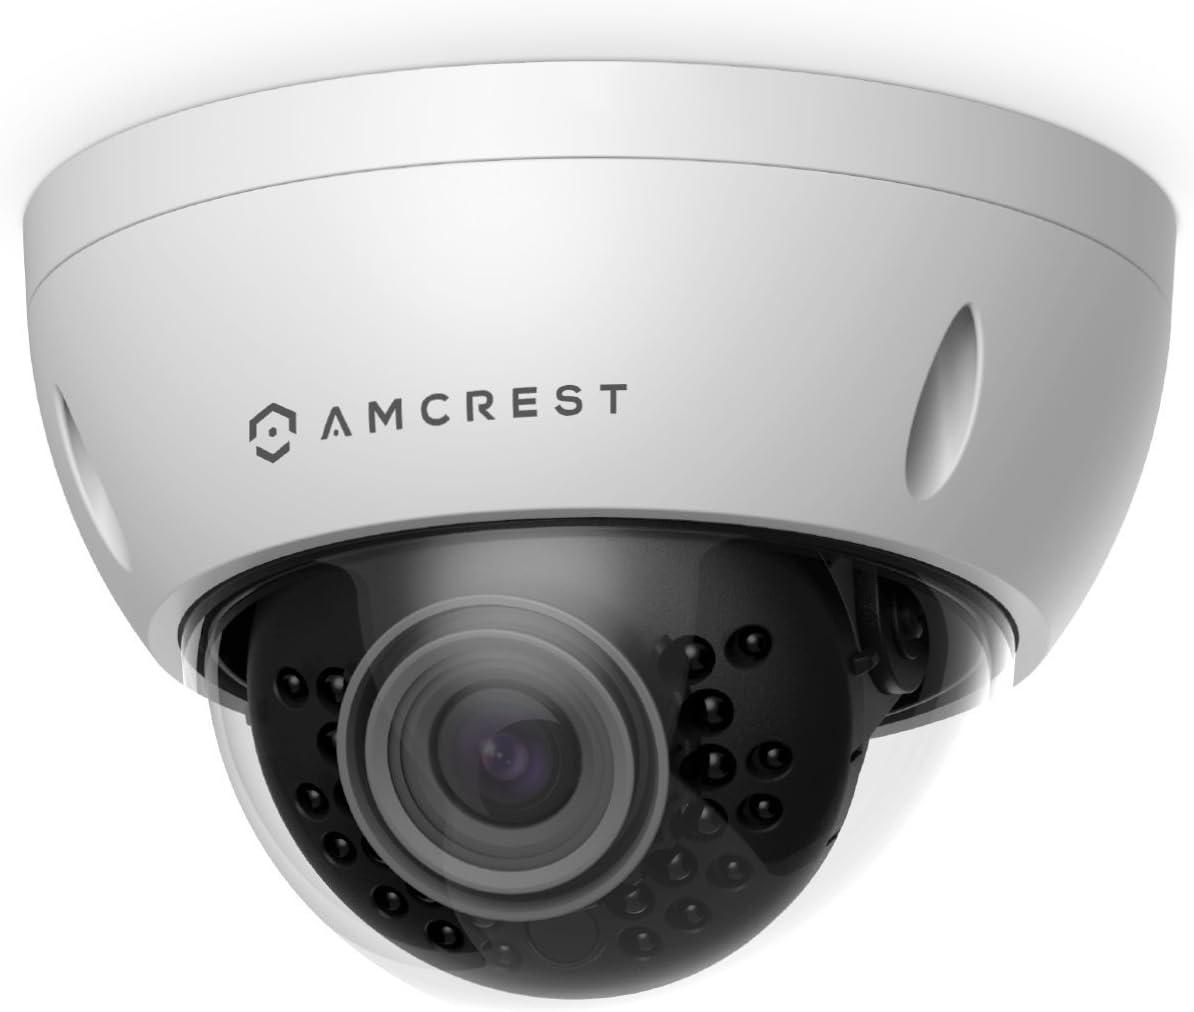 Amcrest ProHD Outdoor 3 Megapixel POE Vandal Dome IP Security Camera – IP67 Weatherproof, IK10 Vandal-Proof, 3MP 2048 TVL , IP3M-956E White